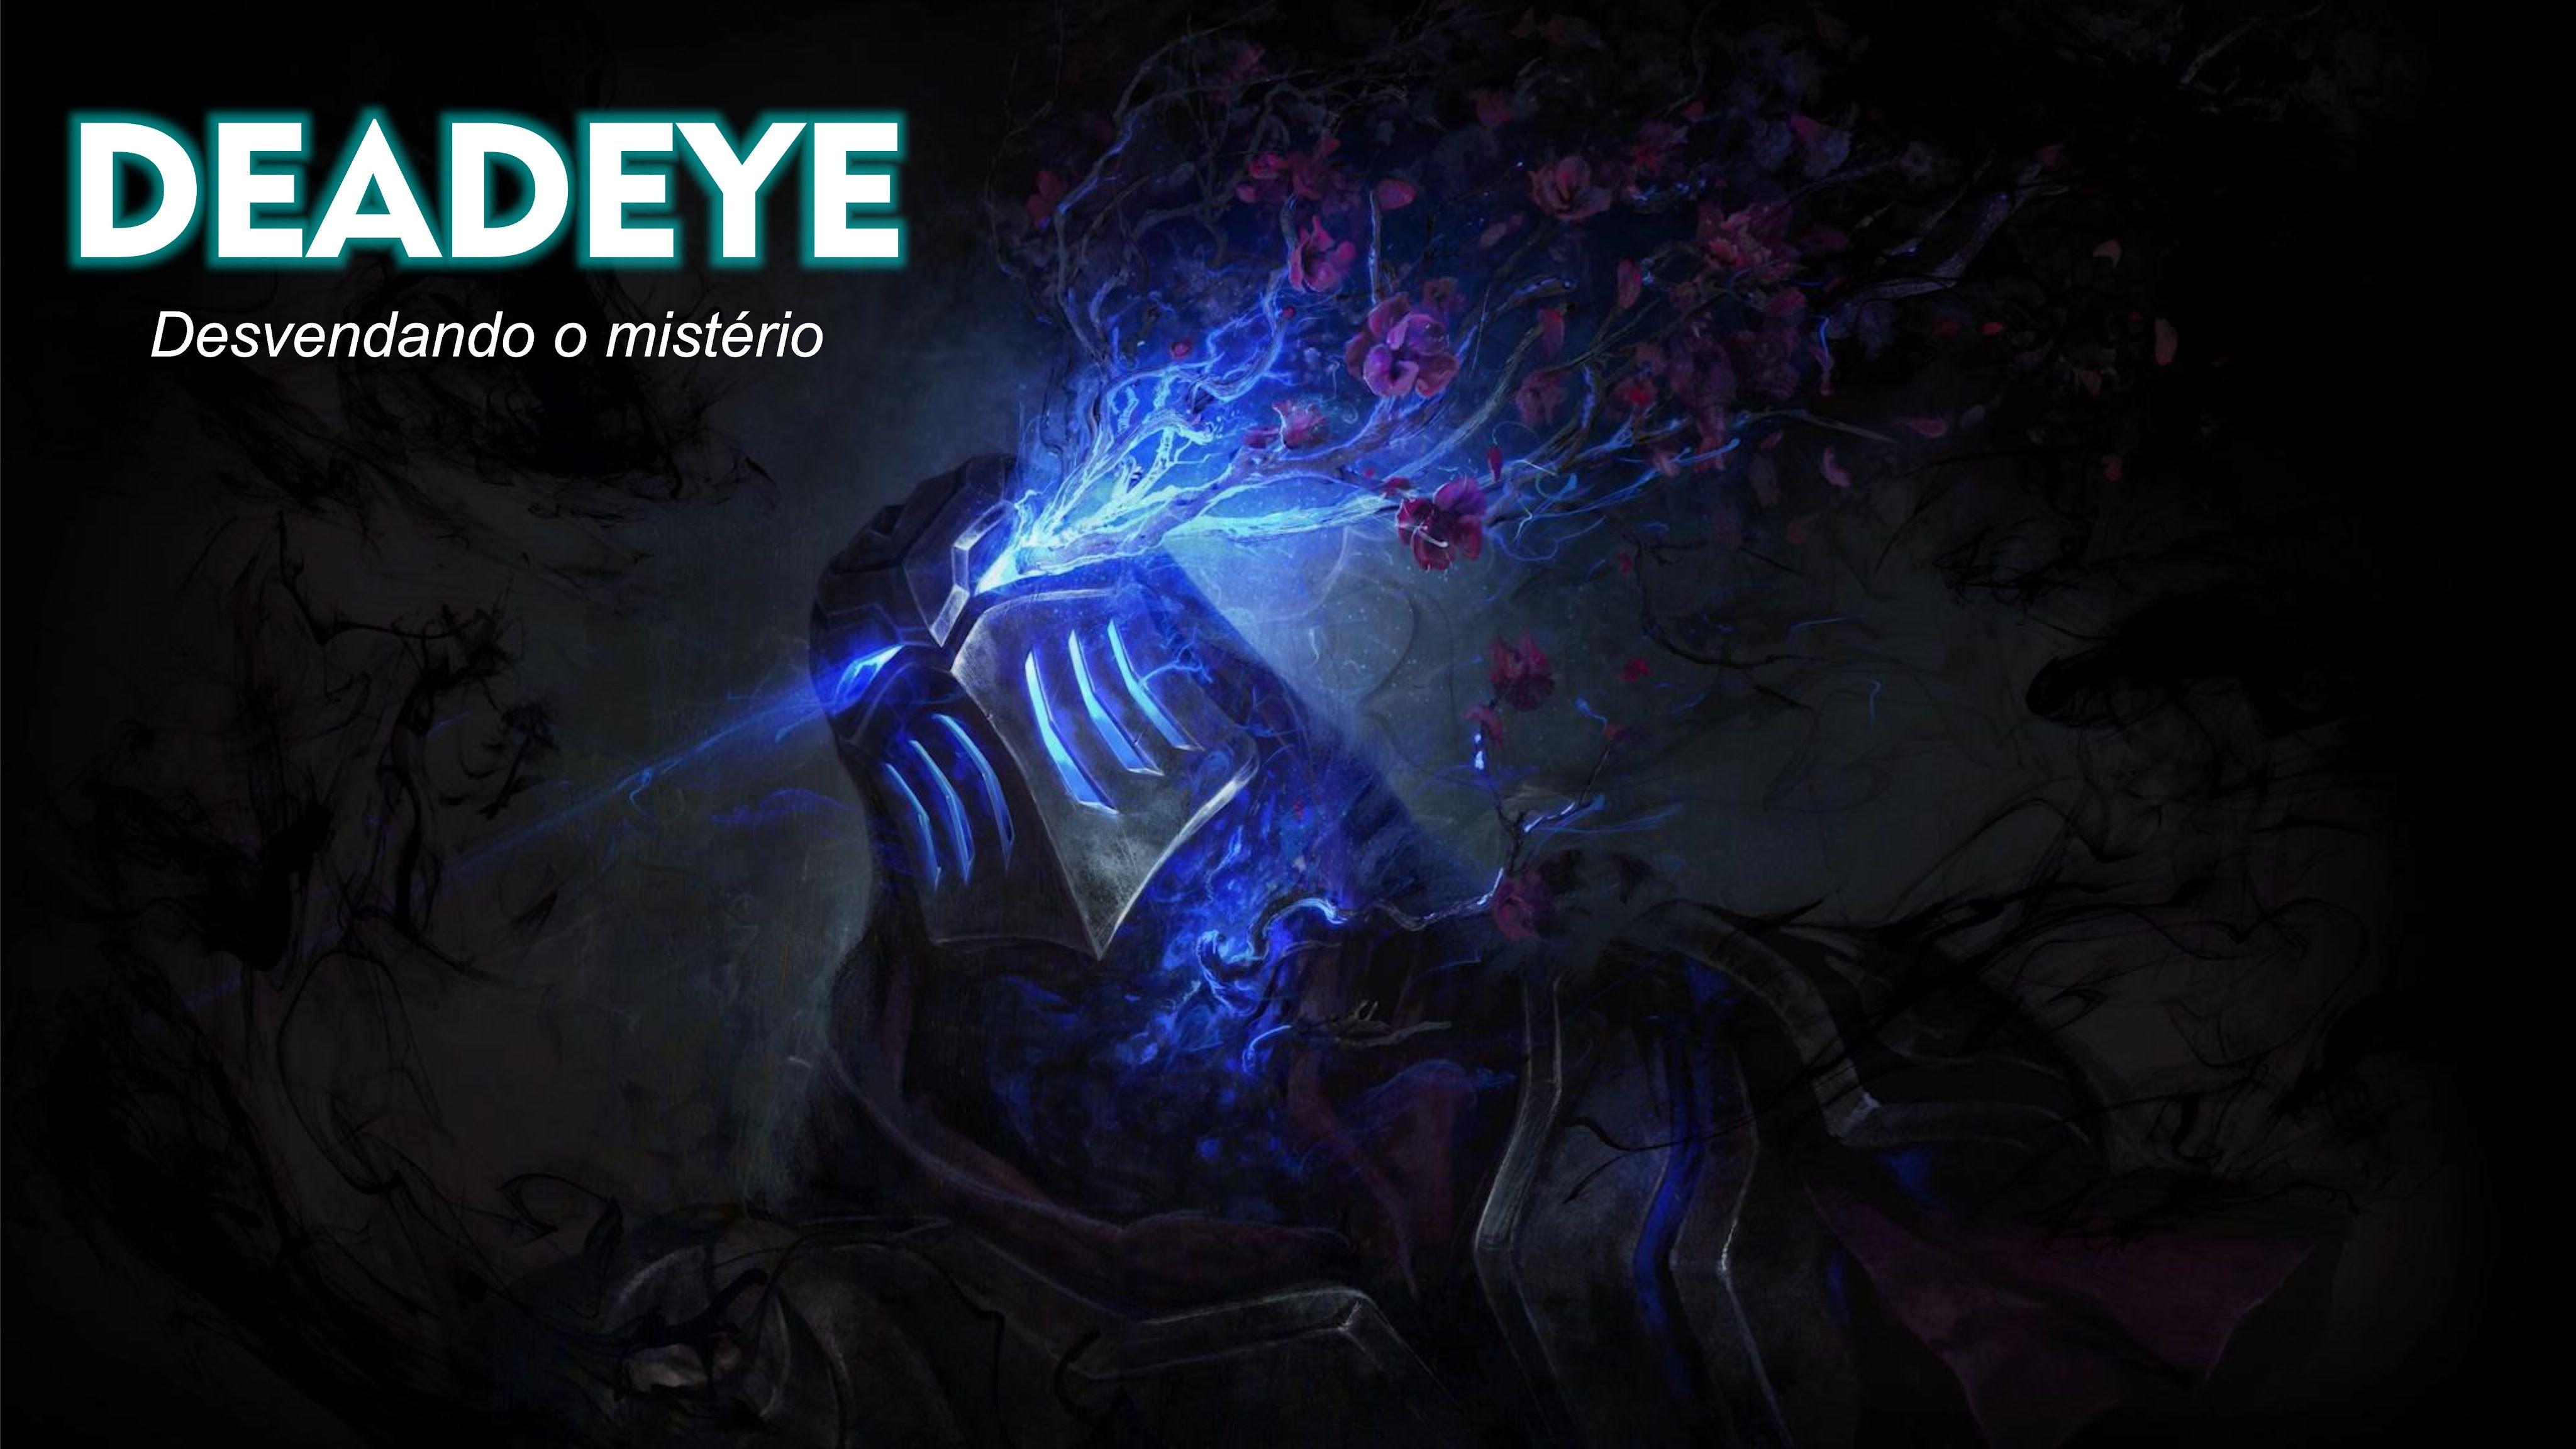 JHIN DEADEYE - O Grande Mistério - league of legends